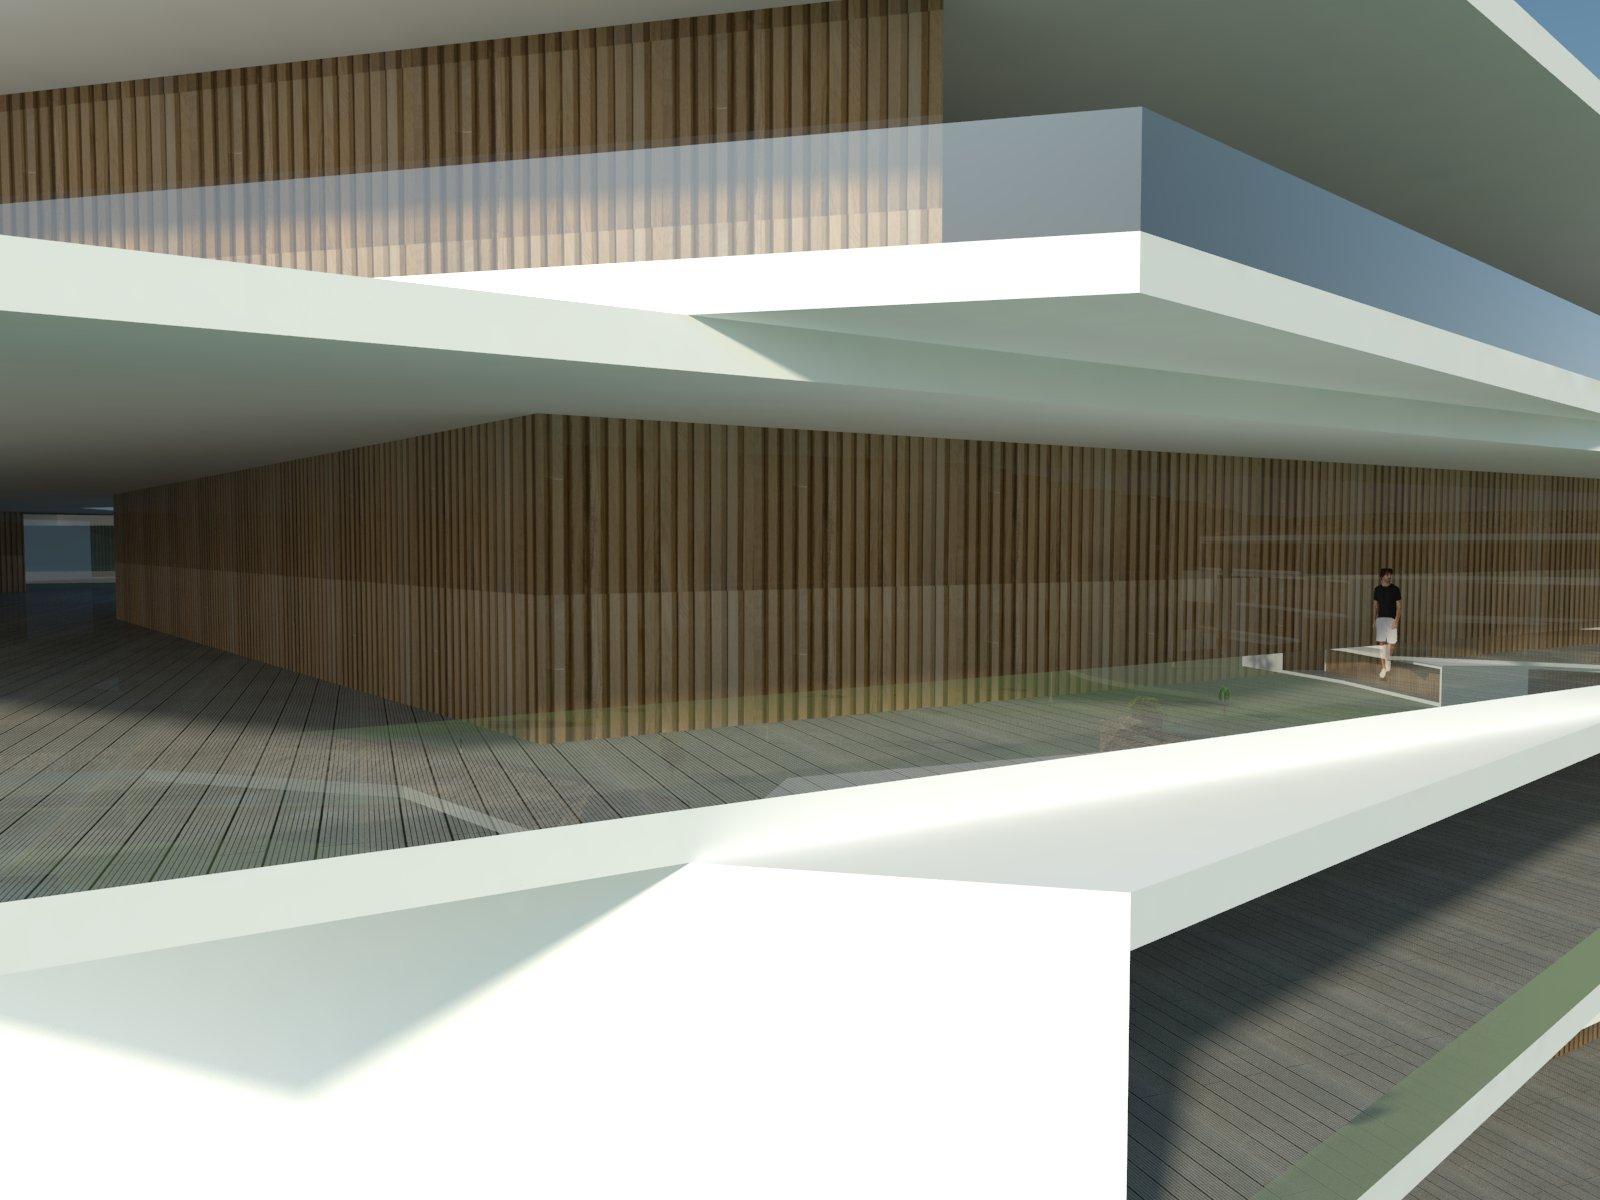 Monte Final - 3D_Unidade Hoteleira - Nucleo Central Pormenor.jpg